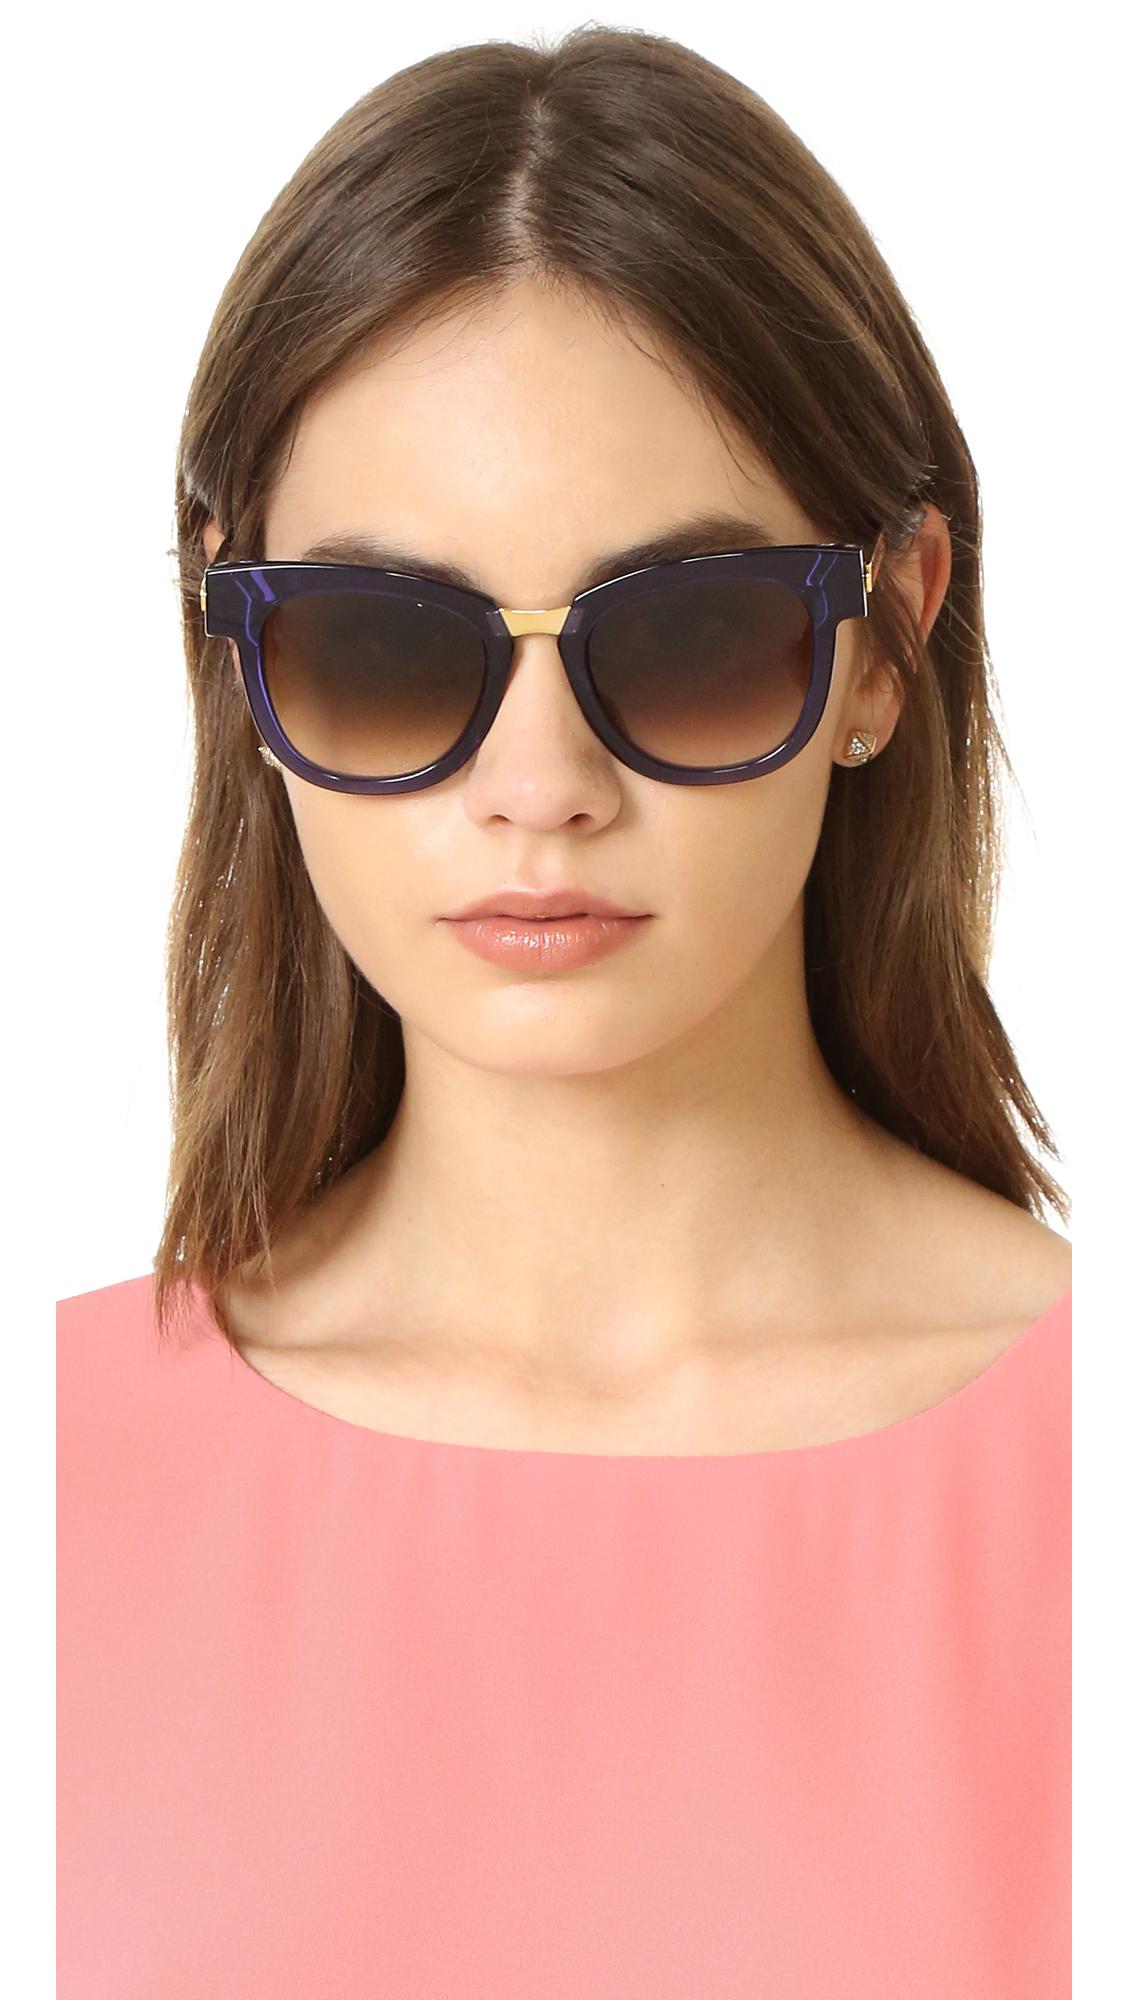 Lasry Mondanity Thierry Sunglasses Lasry Shopbop Shopbop Sunglasses Mondanity Thierry EtqtwgyxS7